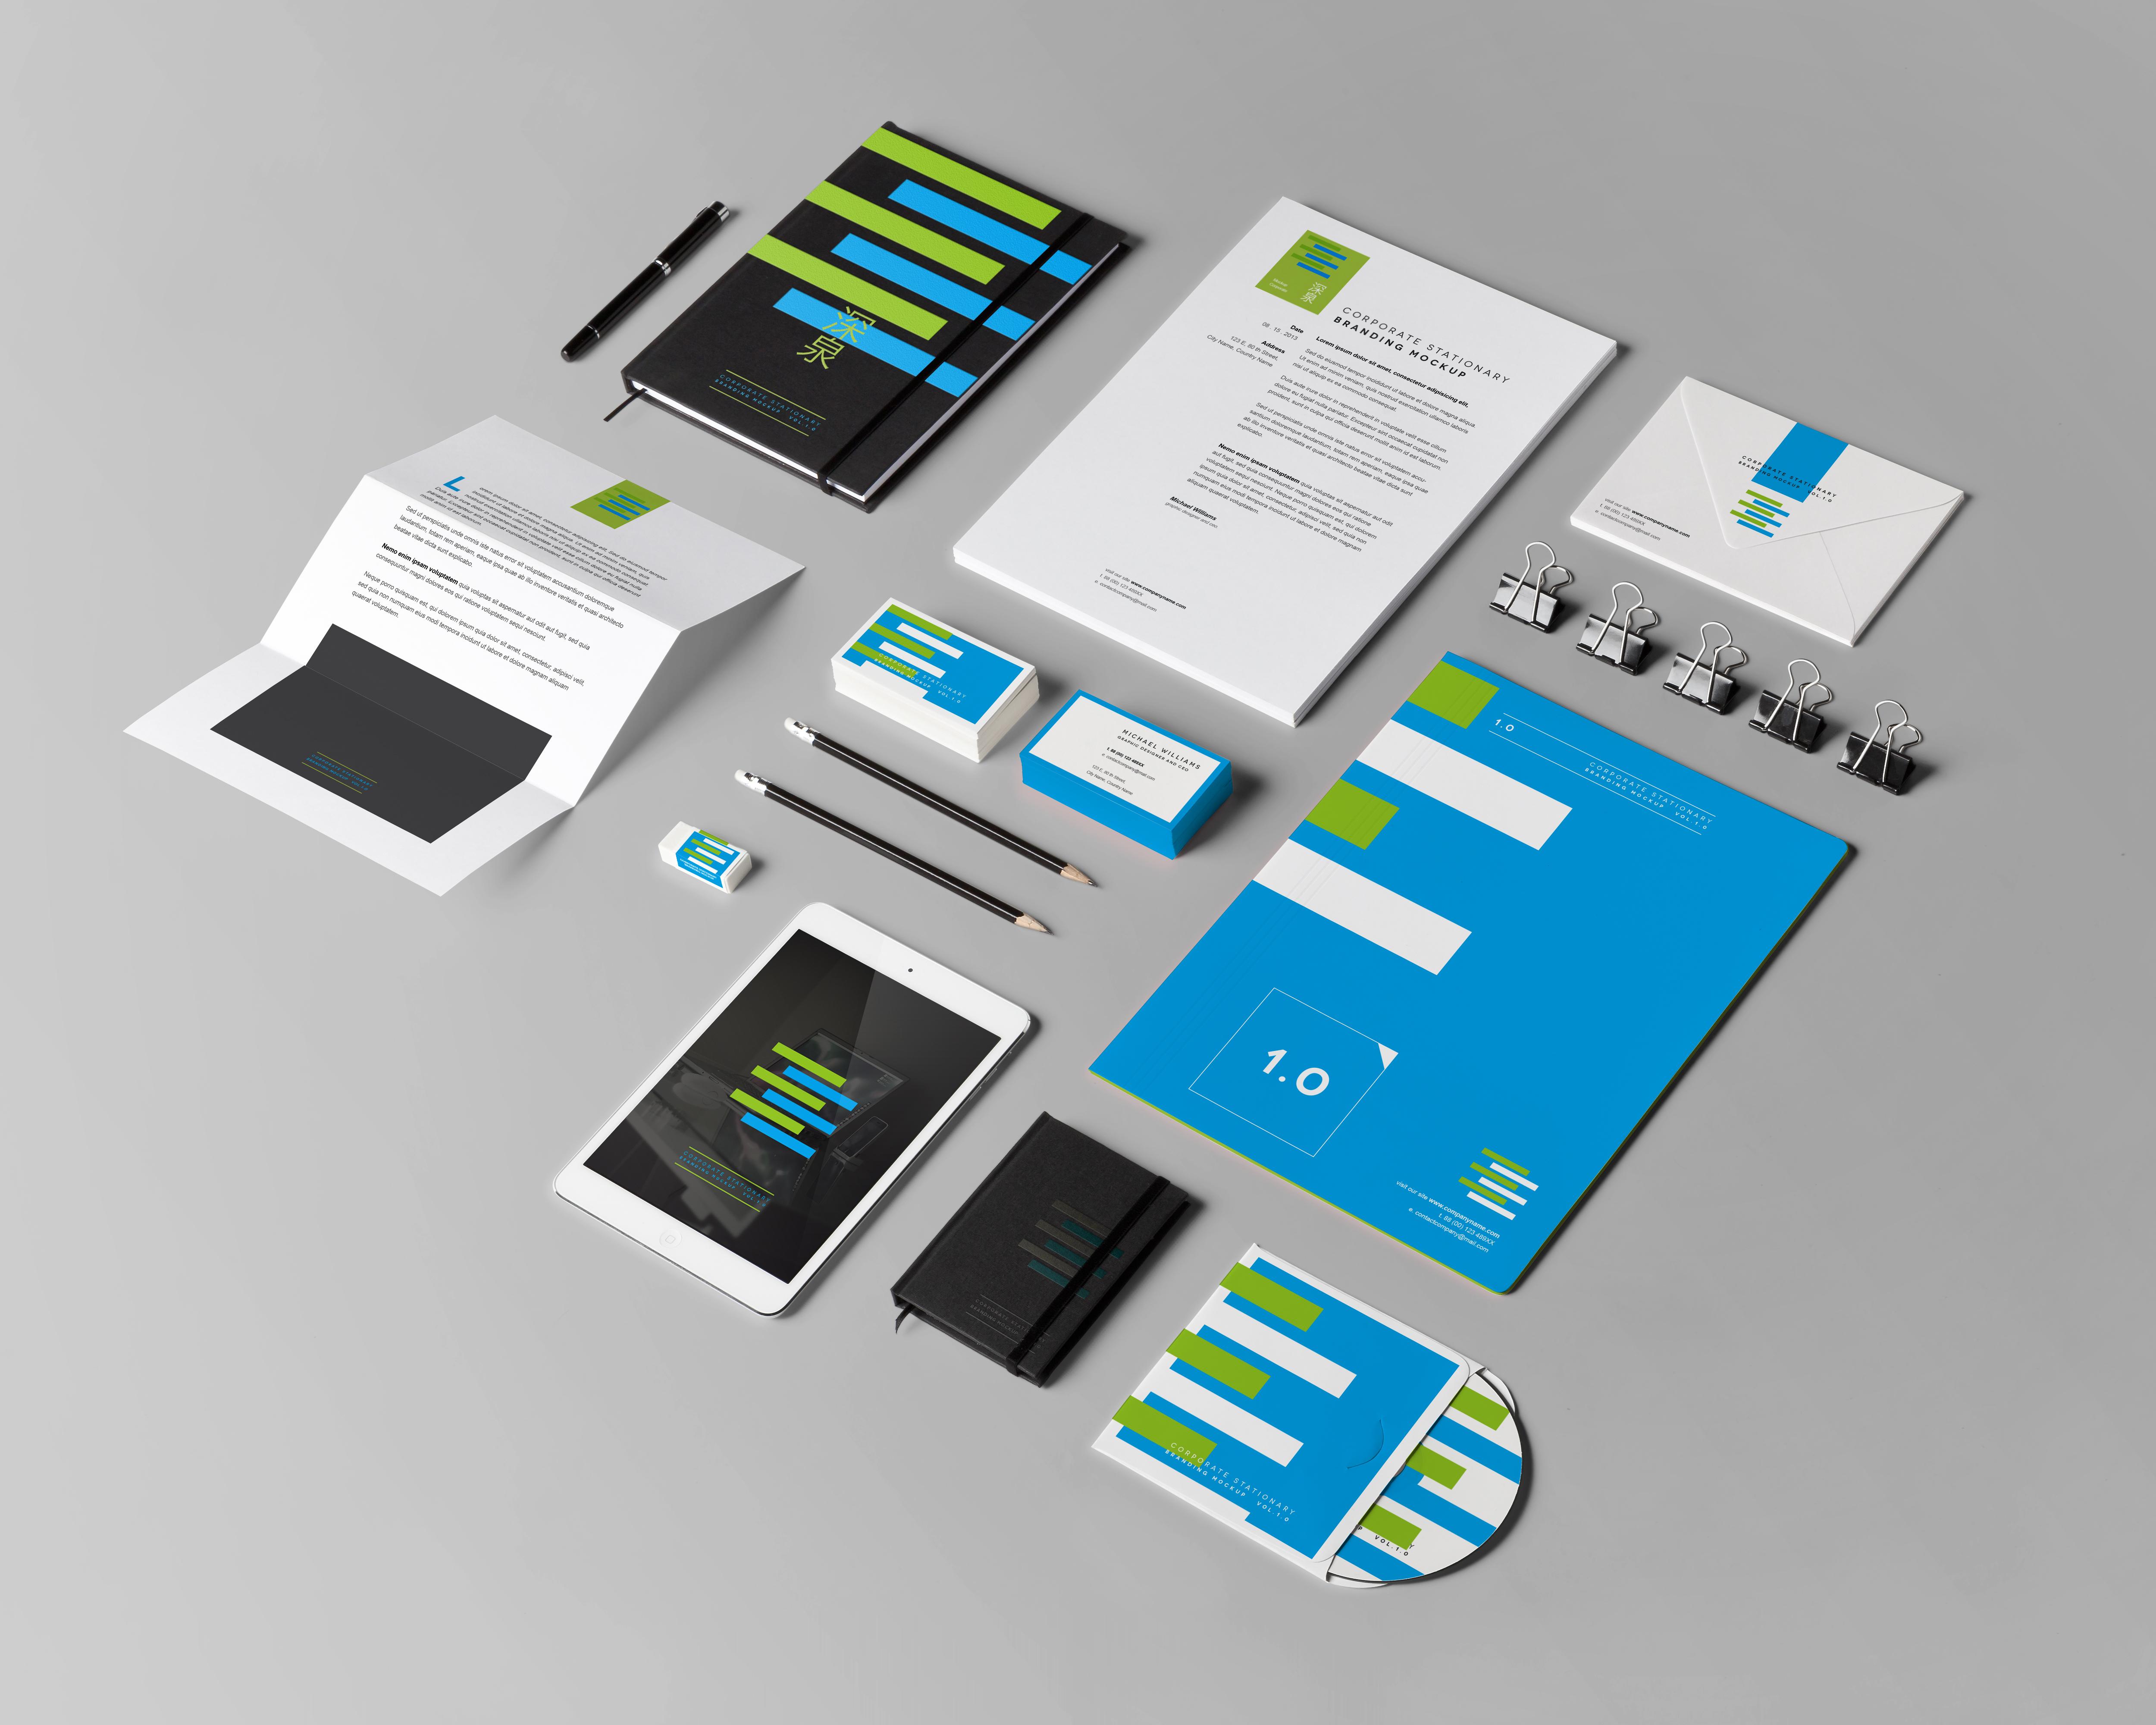 LOGO设计原创LOGO标志产品图标产品包装设计VI应用PP